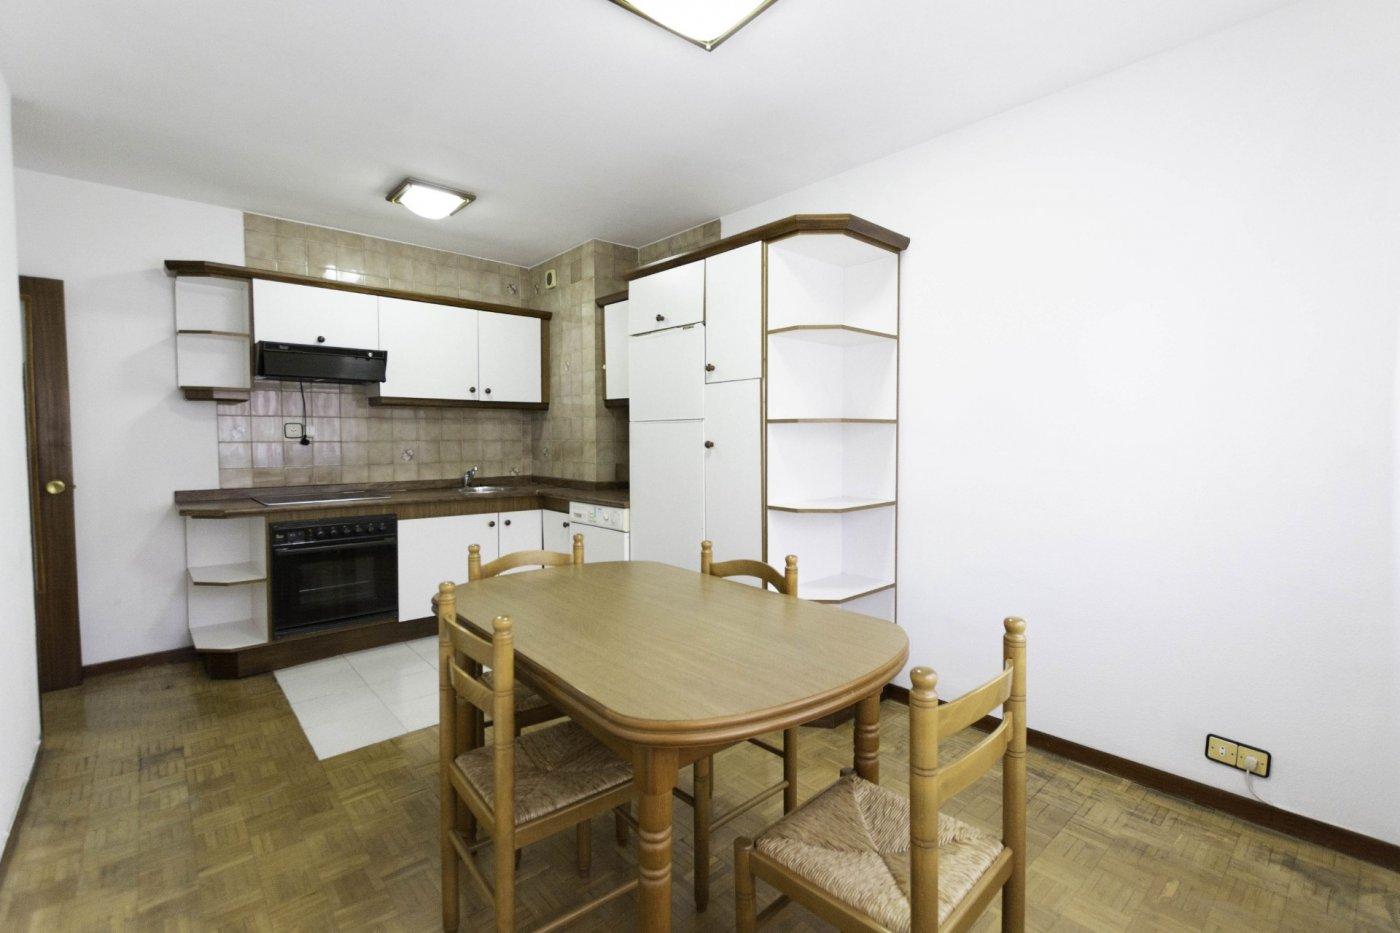 Apartamento en vallobin - imagenInmueble1